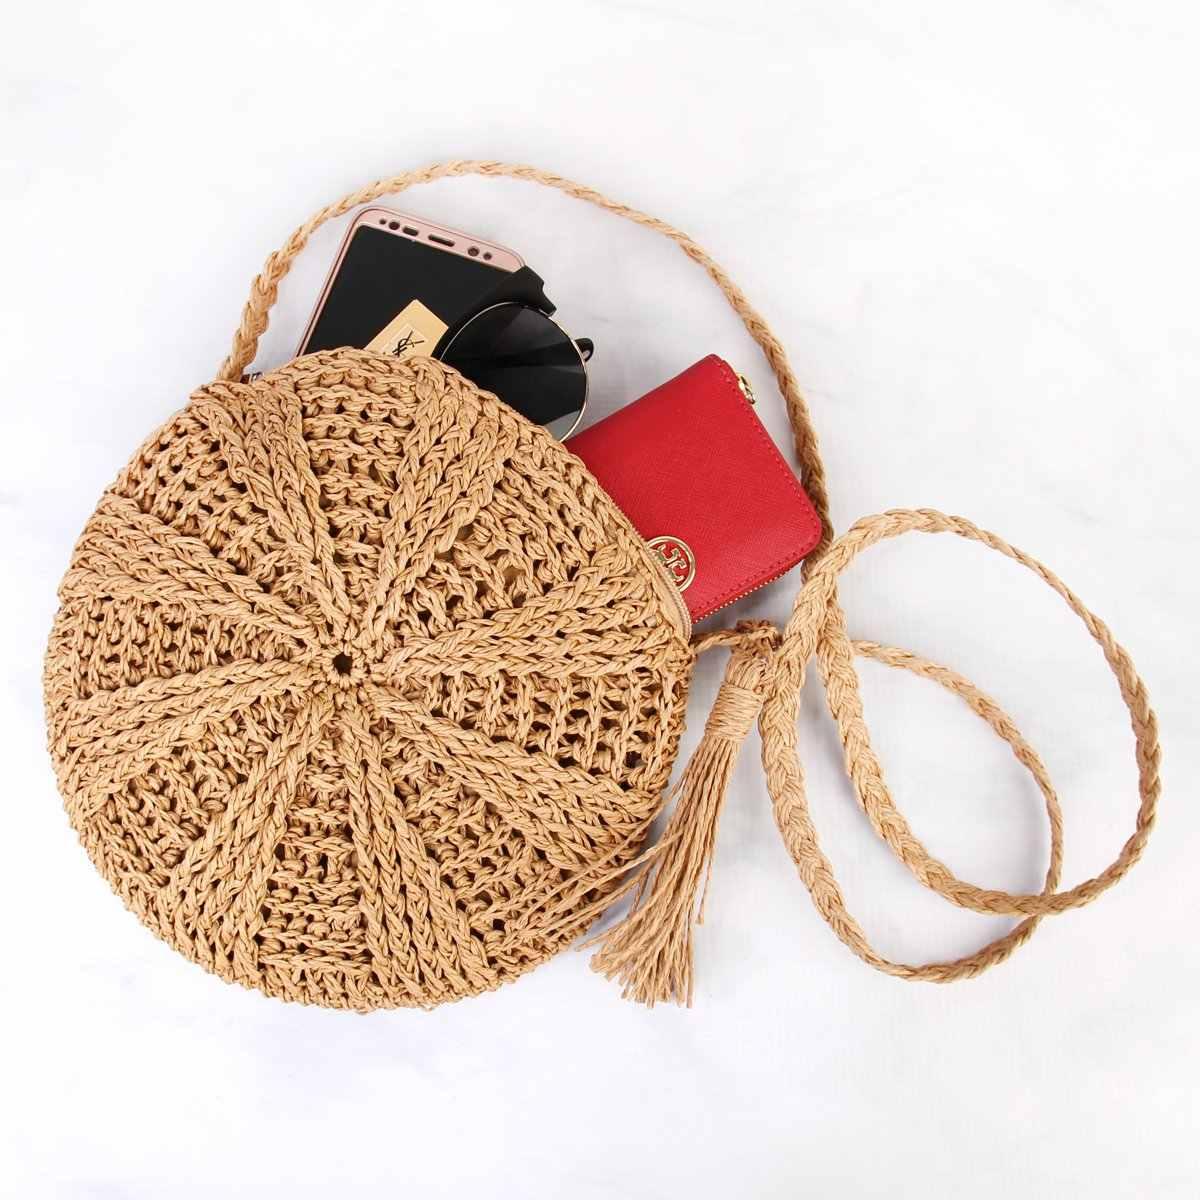 FGGS-Rotan Crochet Jerami Keranjang Anyaman Bali Bulat Tas Tangan Lingkaran Selempang Belanja Pantai Tote Tas